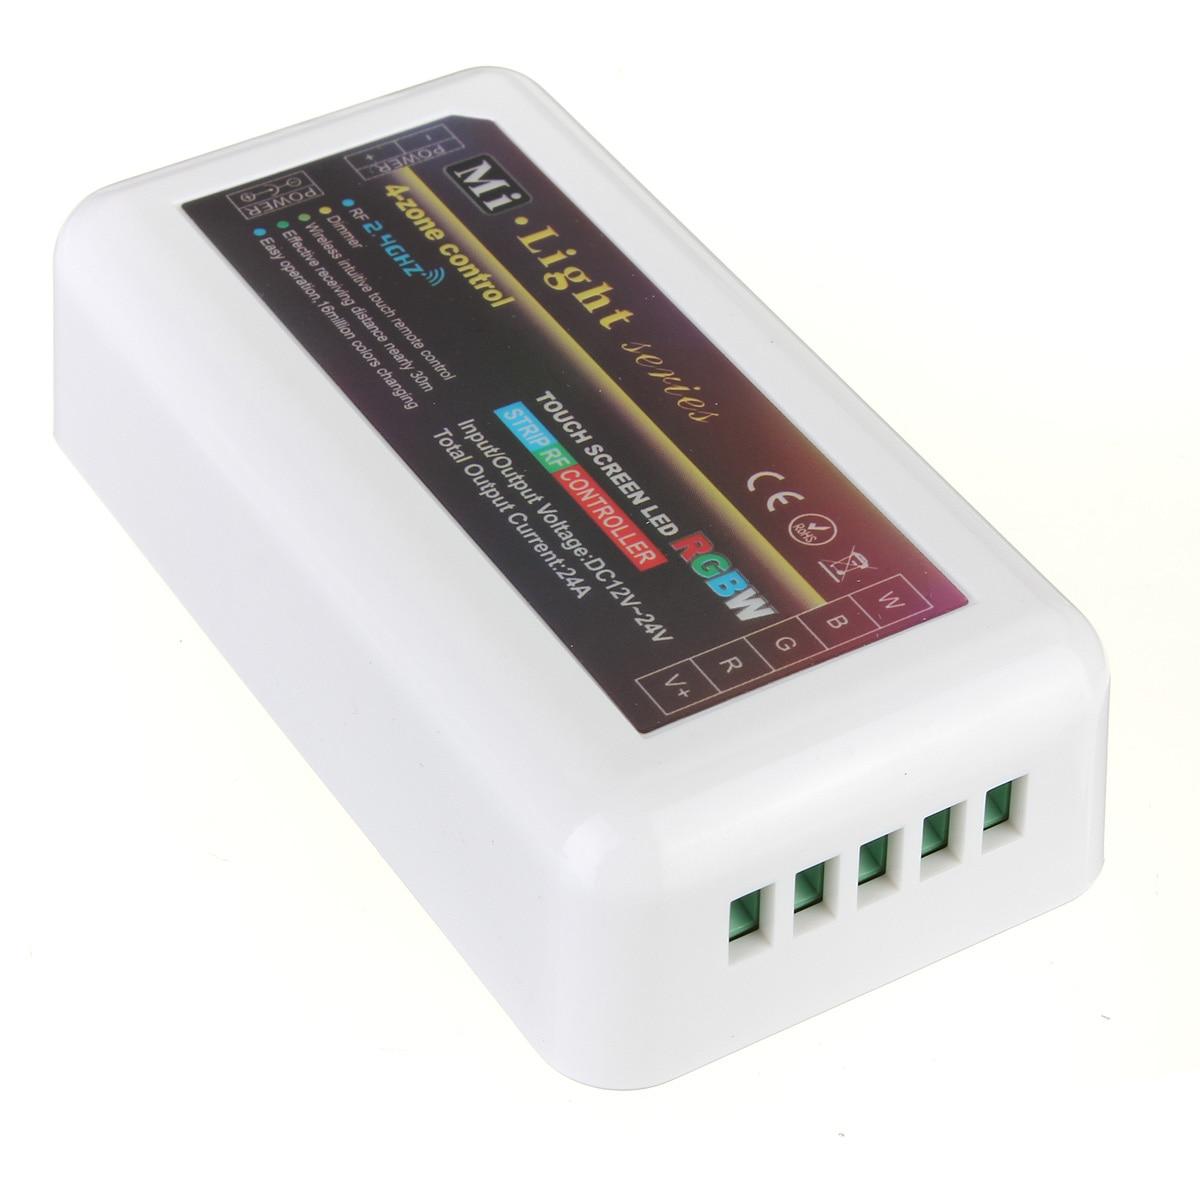 Smuxi 2,4G inalámbrico Mi luz remoto RF 4-zona WiFi RGBW WW/CW RGB controlador de tira led